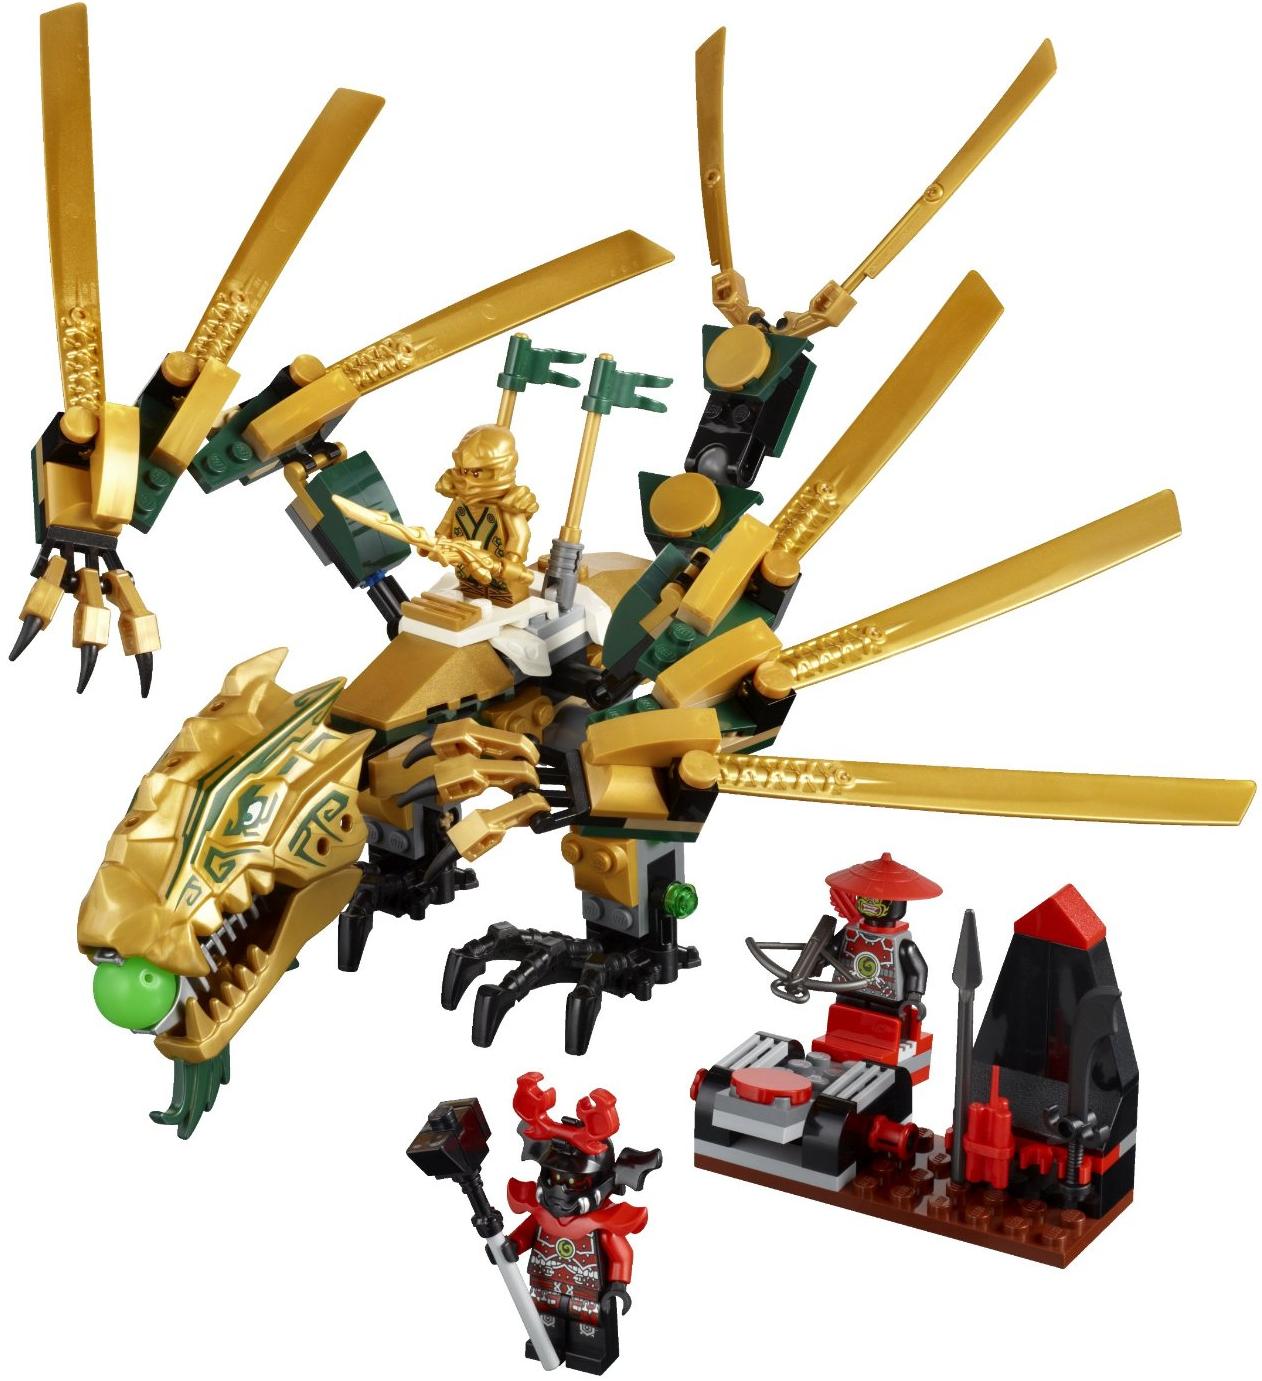 70503 The Golden Dragon | Ninjago Wiki | FANDOM powered by Wikia